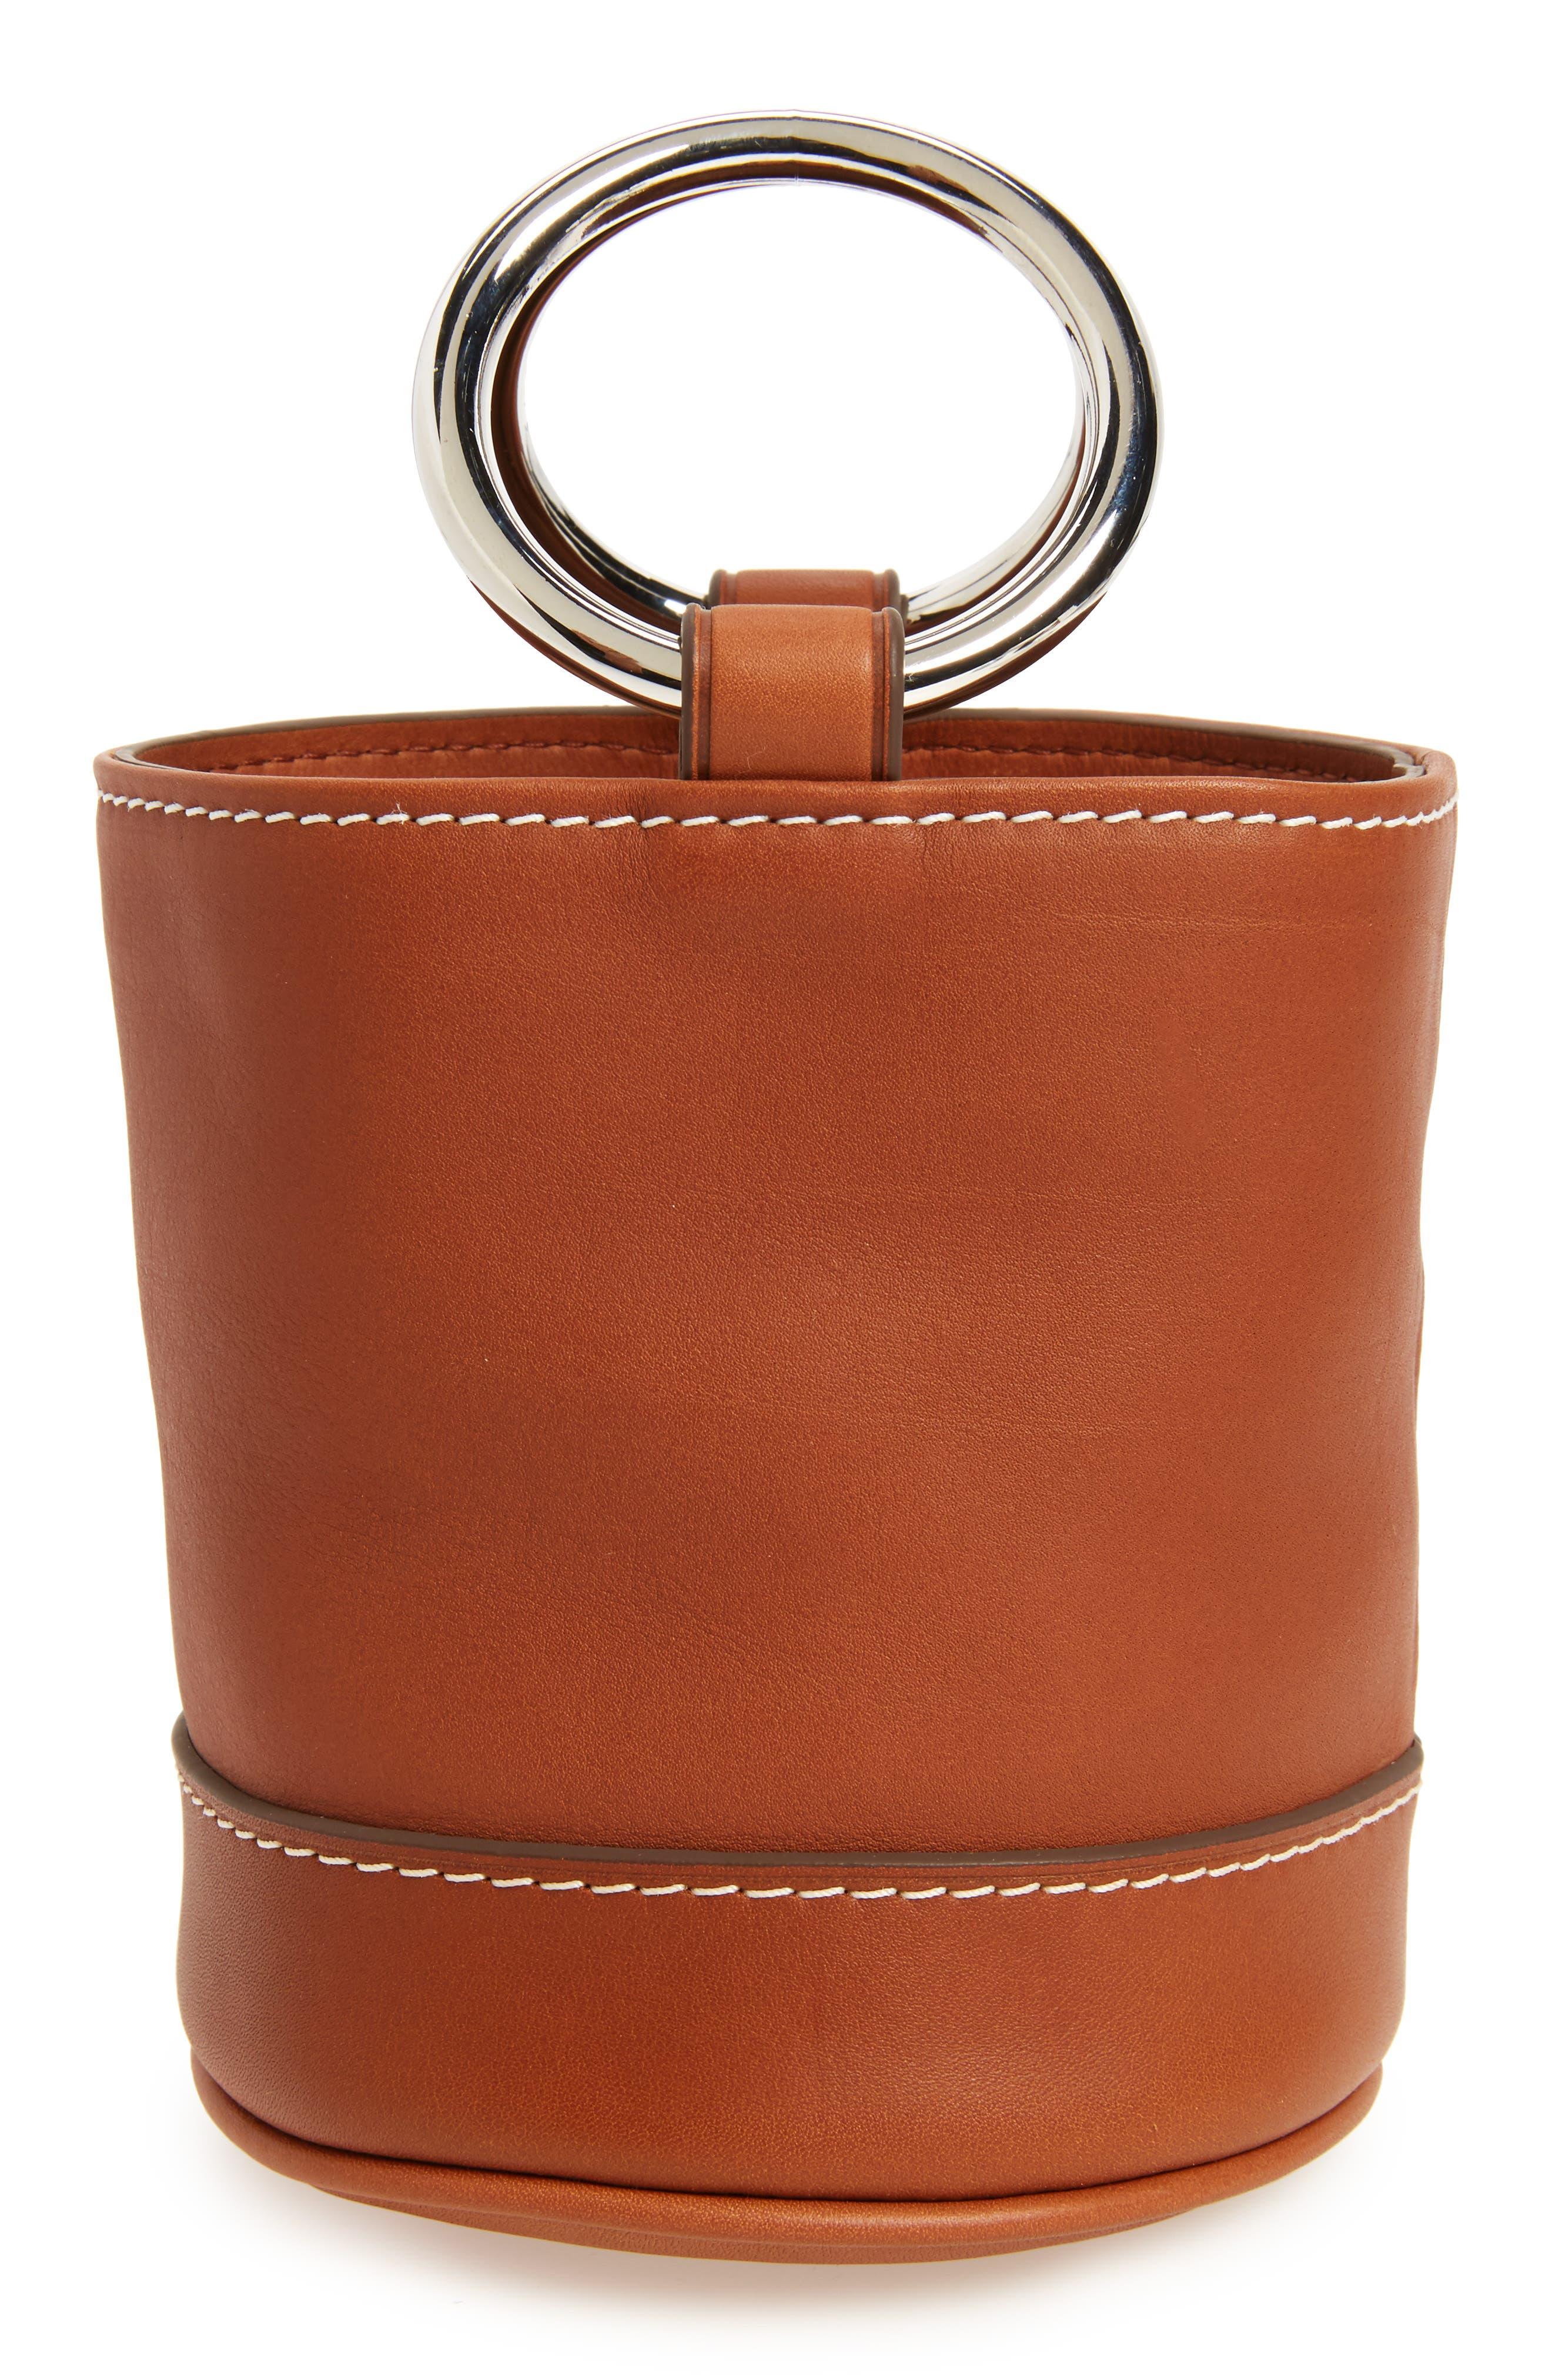 Alternate Image 1 Selected - Simon Miller Bonsai Calfskin Leather Bucket Bag